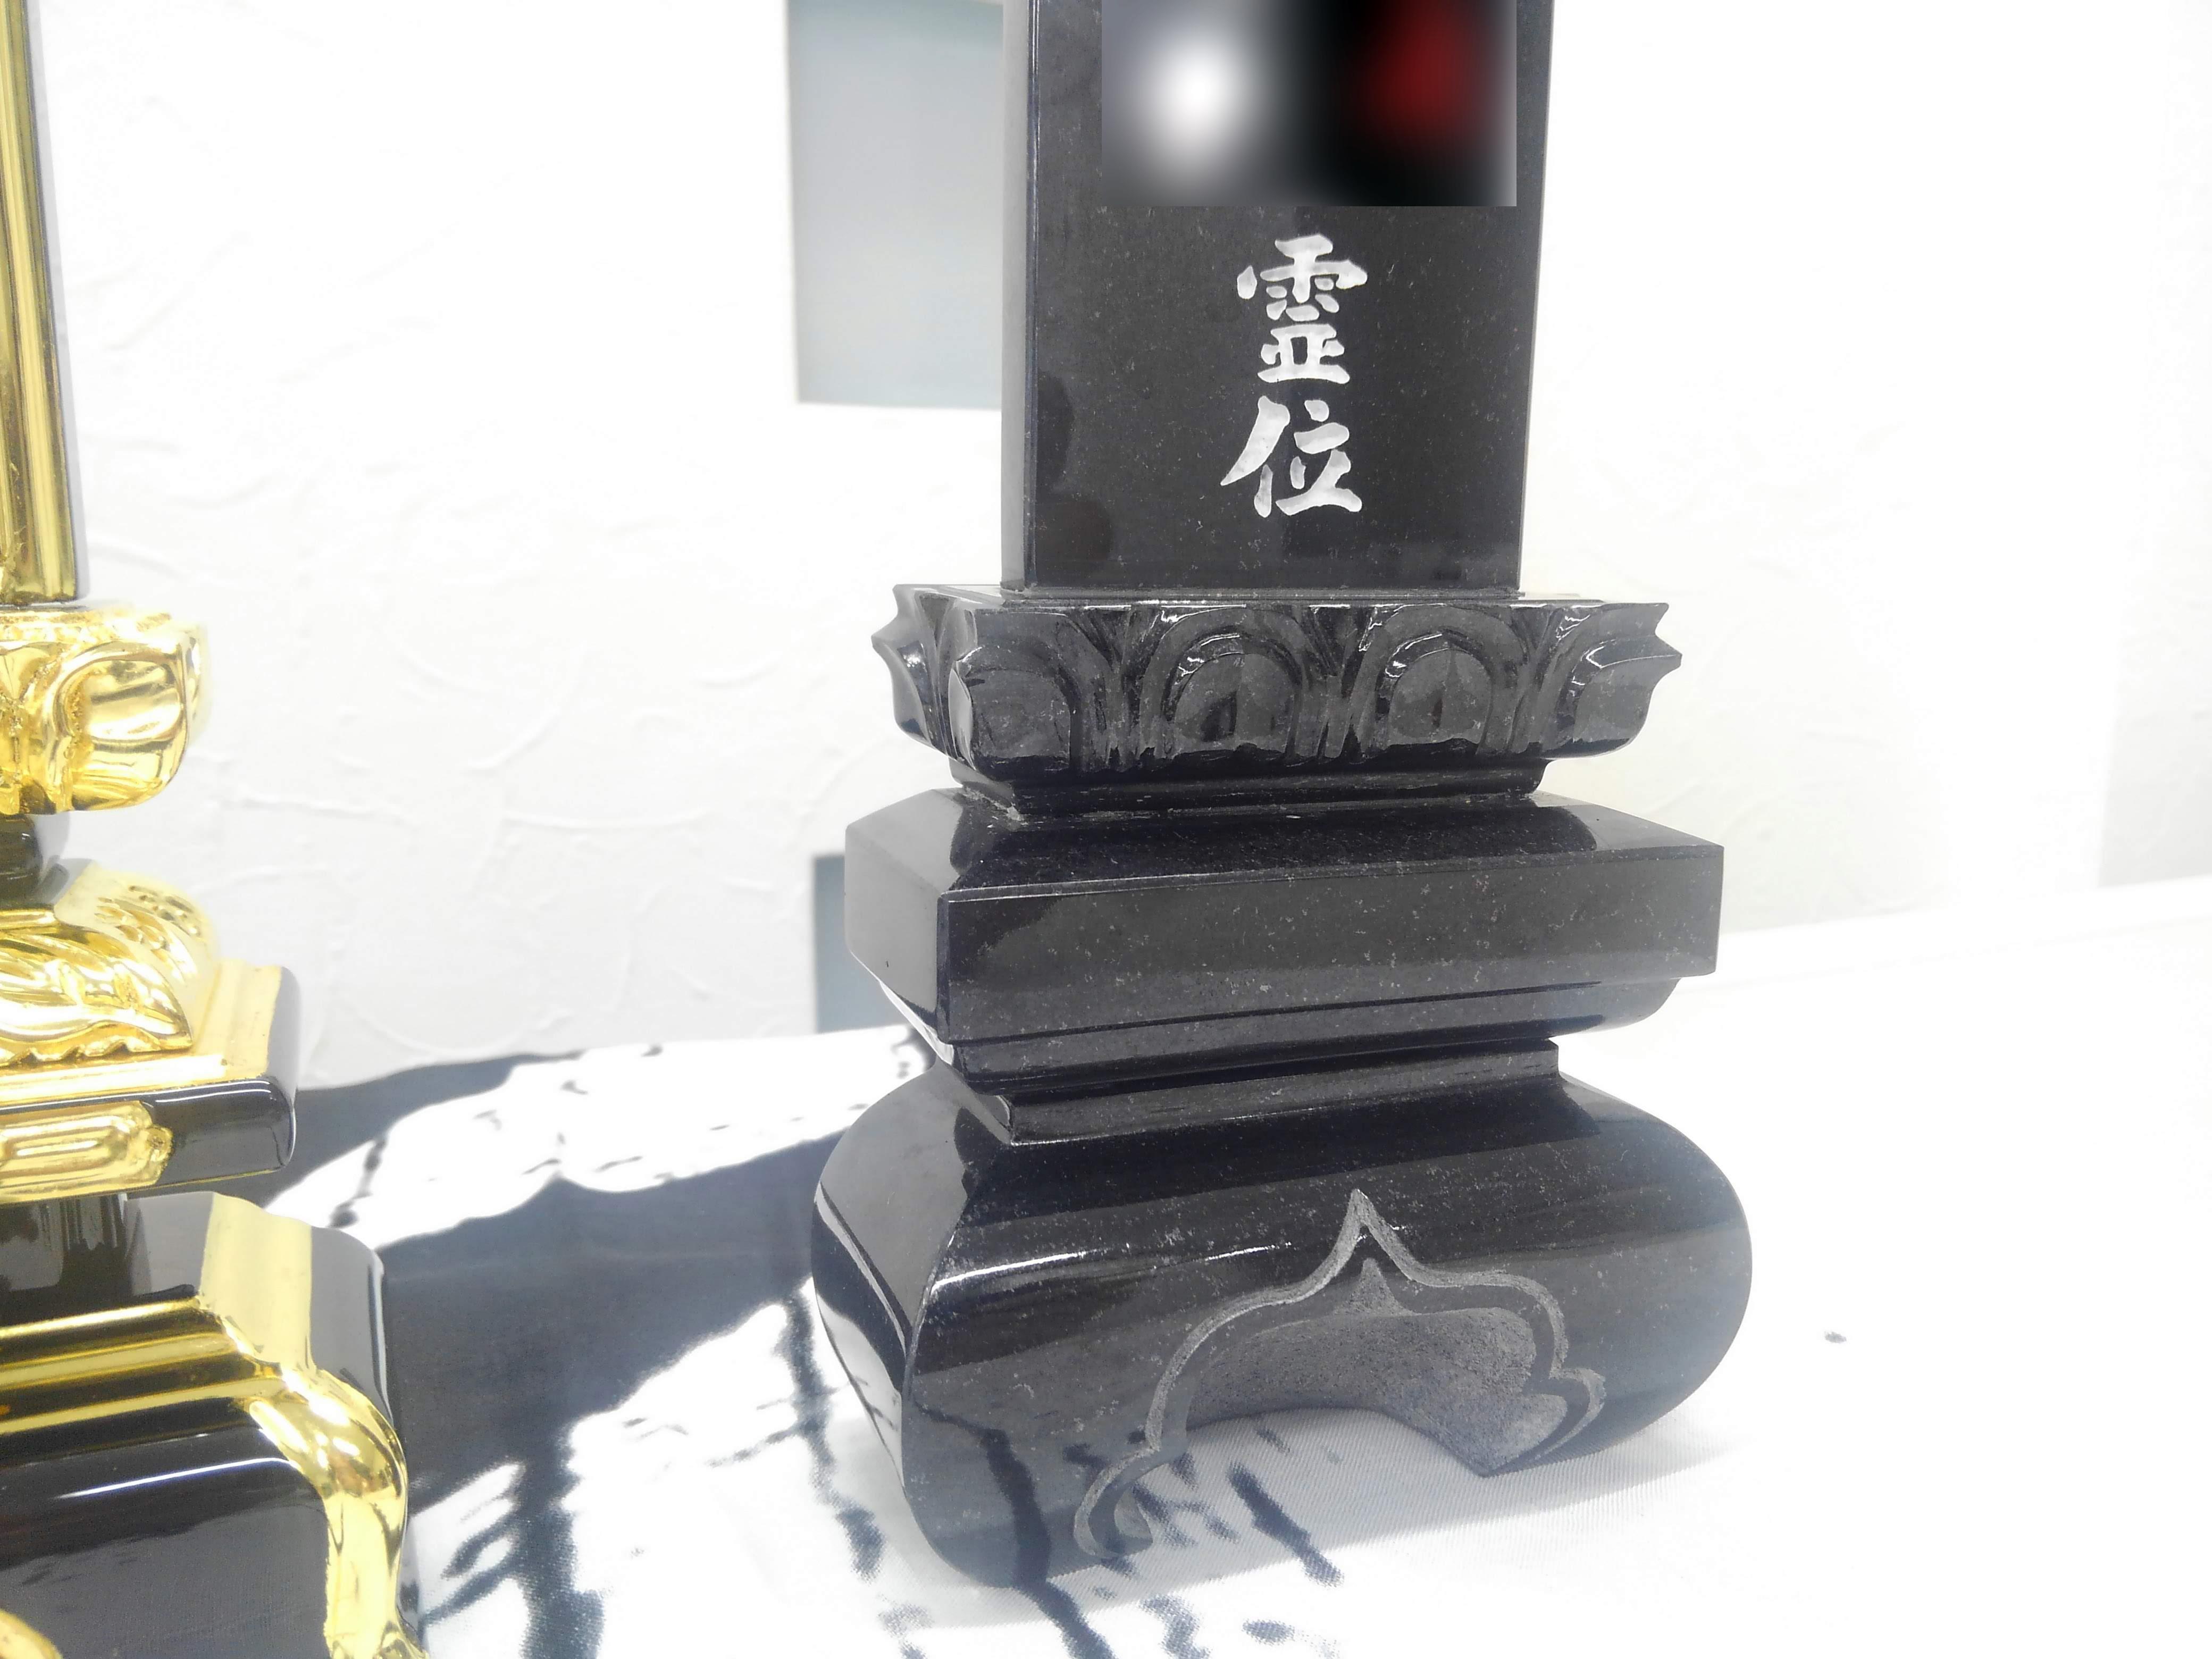 https://www.morita-stone.co.jp/weblog/img/20181010%E7%9F%B3%E3%81%AE%E4%BD%8D%E7%89%8C1.jpg